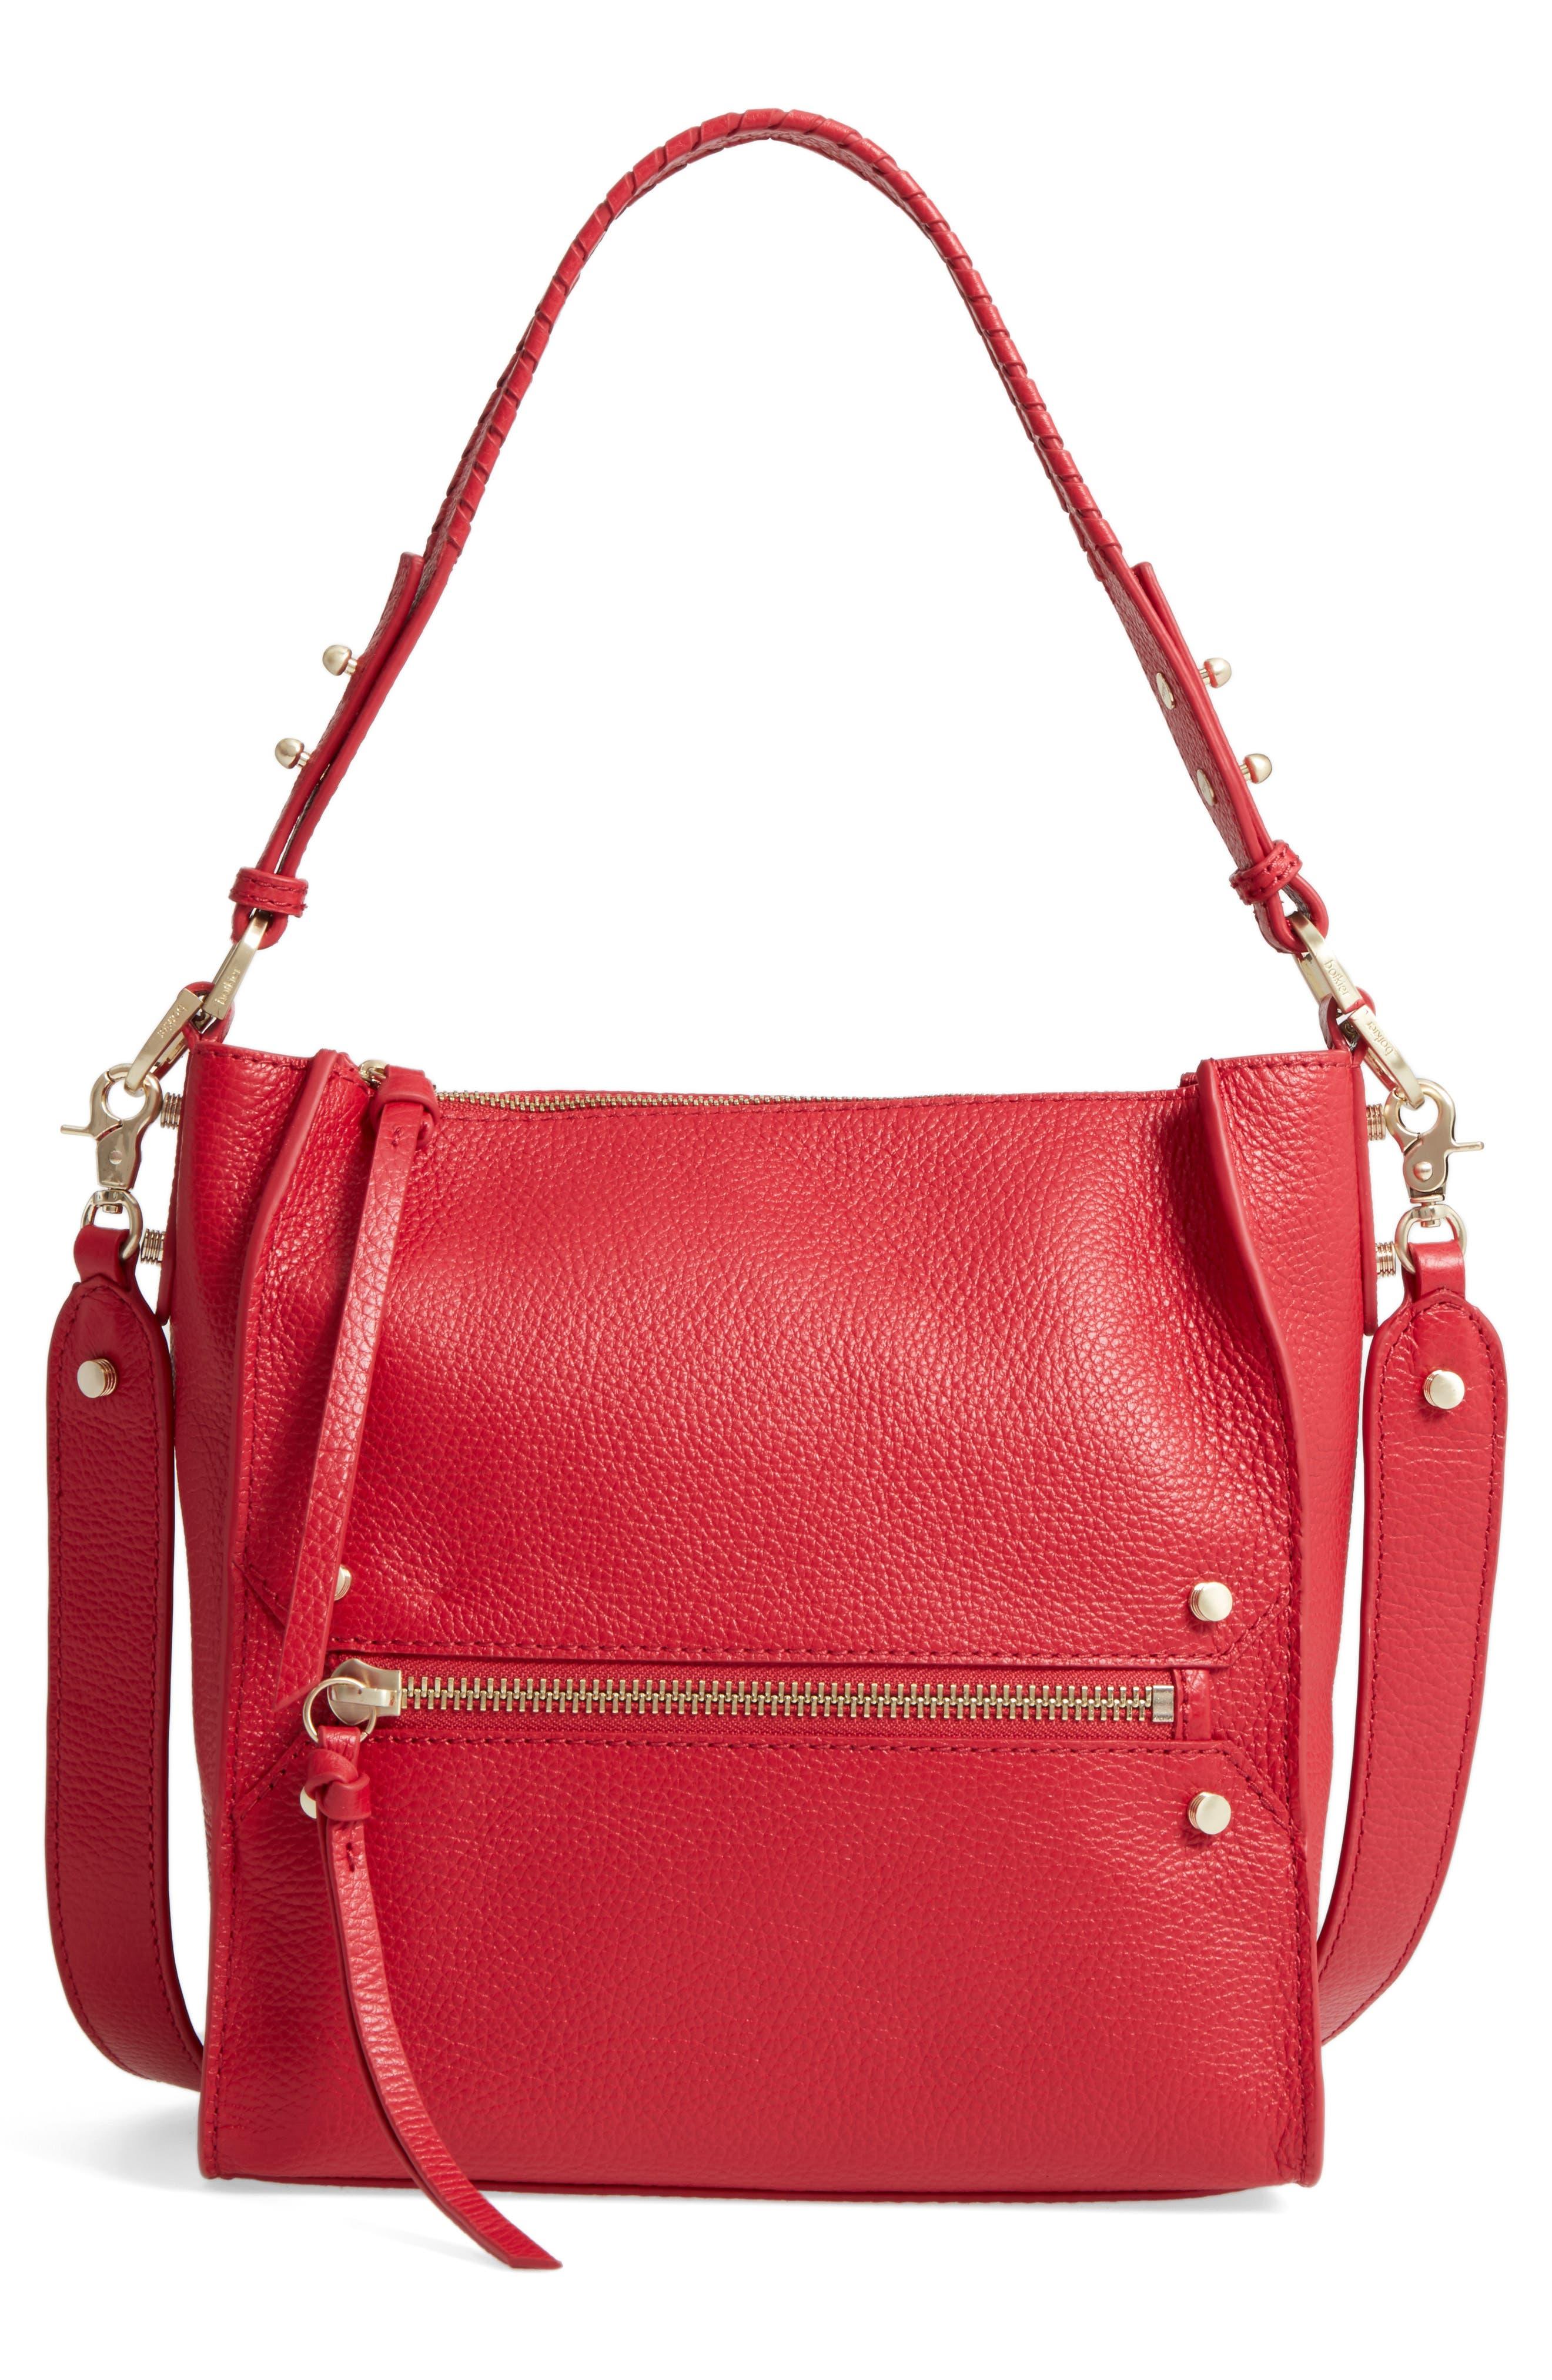 Main Image - Botkier Small Paloma Leather Hobo